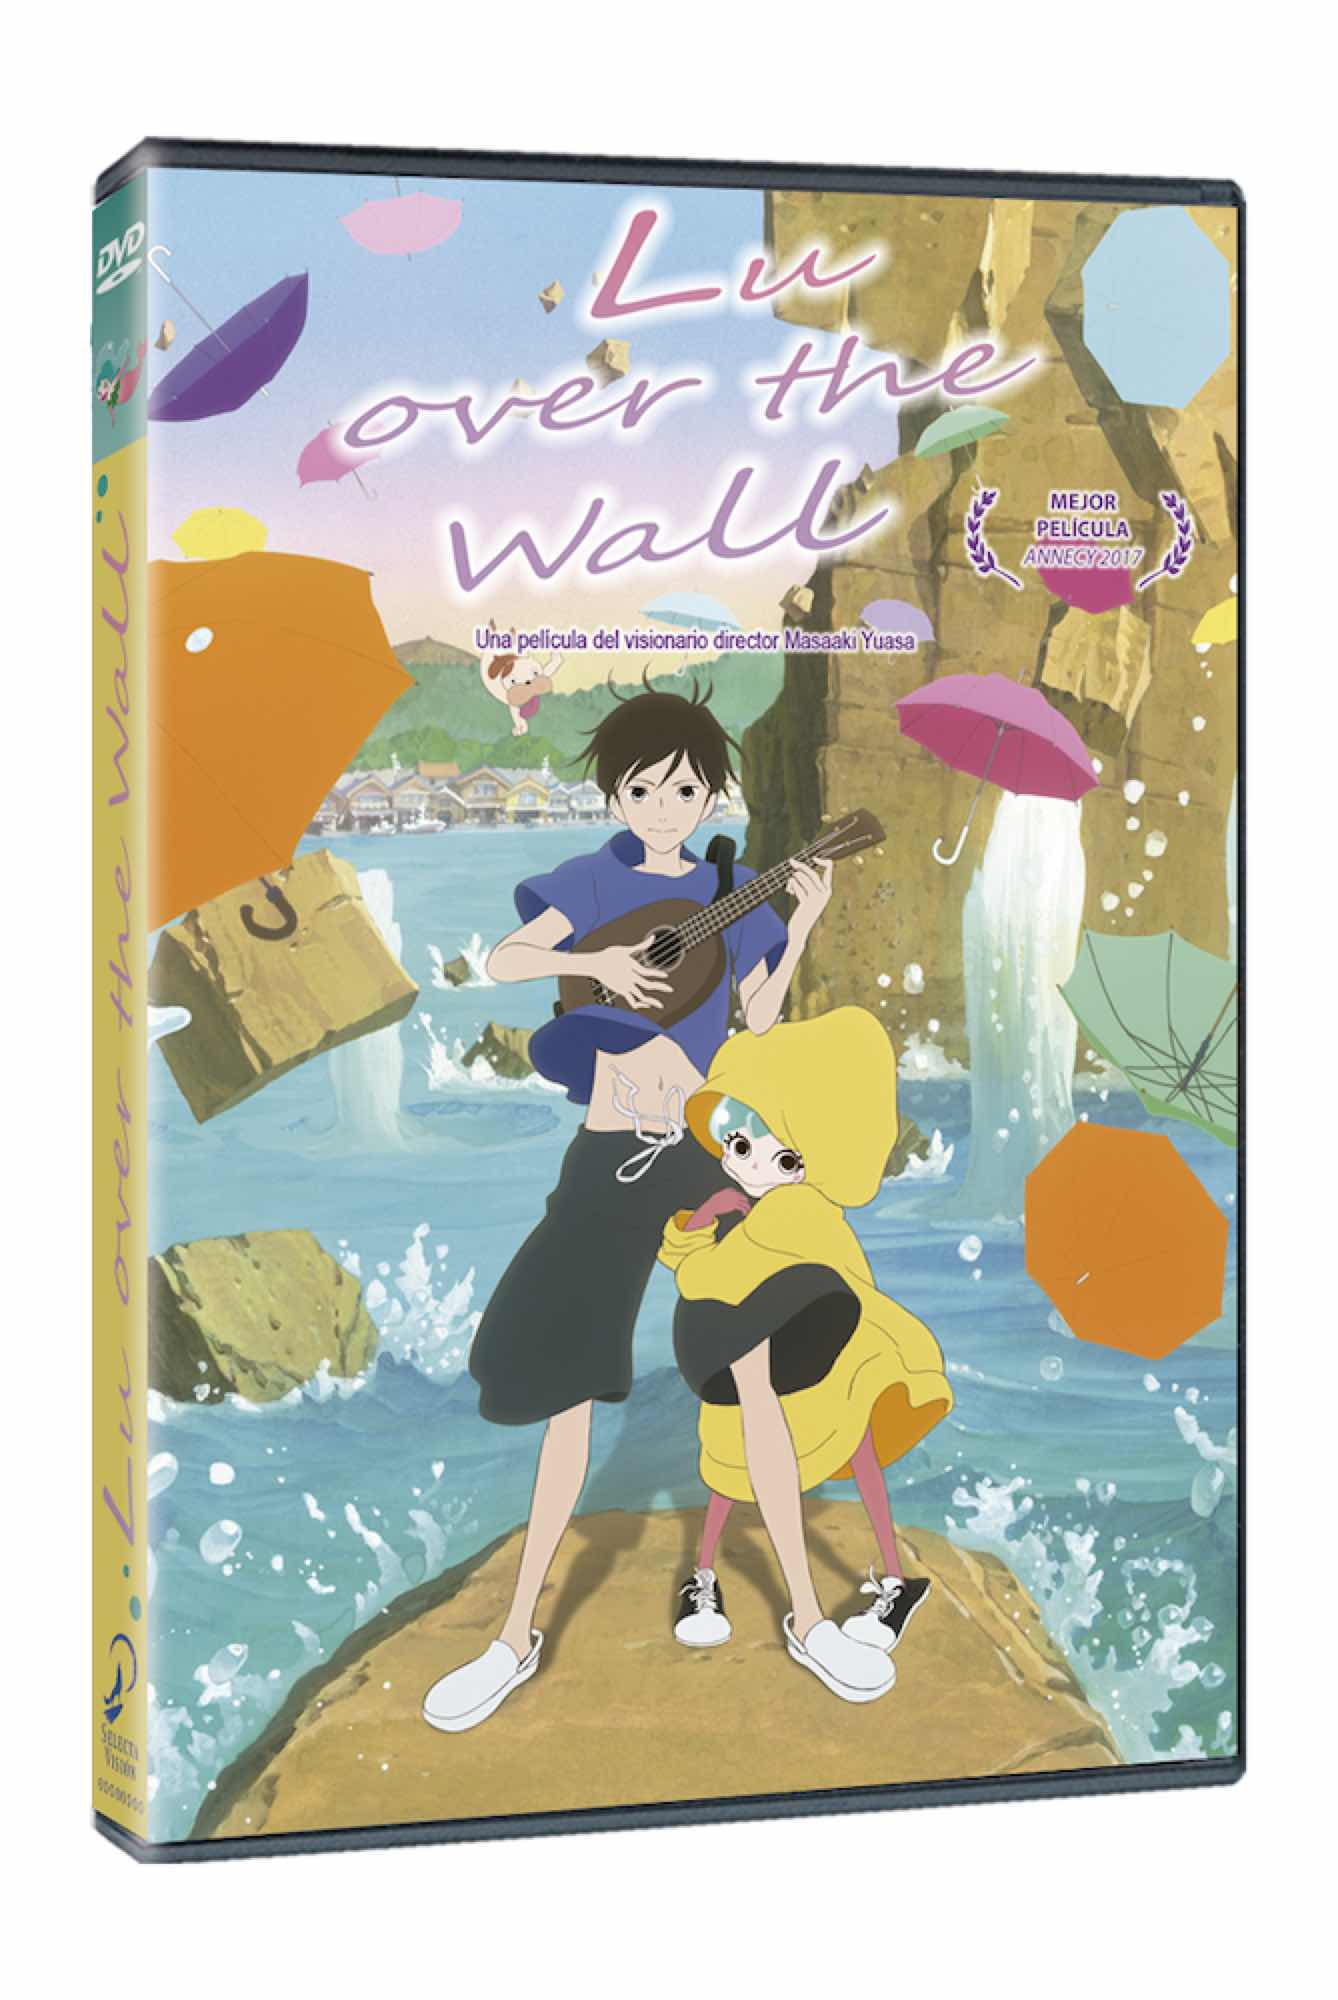 DVD LU OVER THE WALL